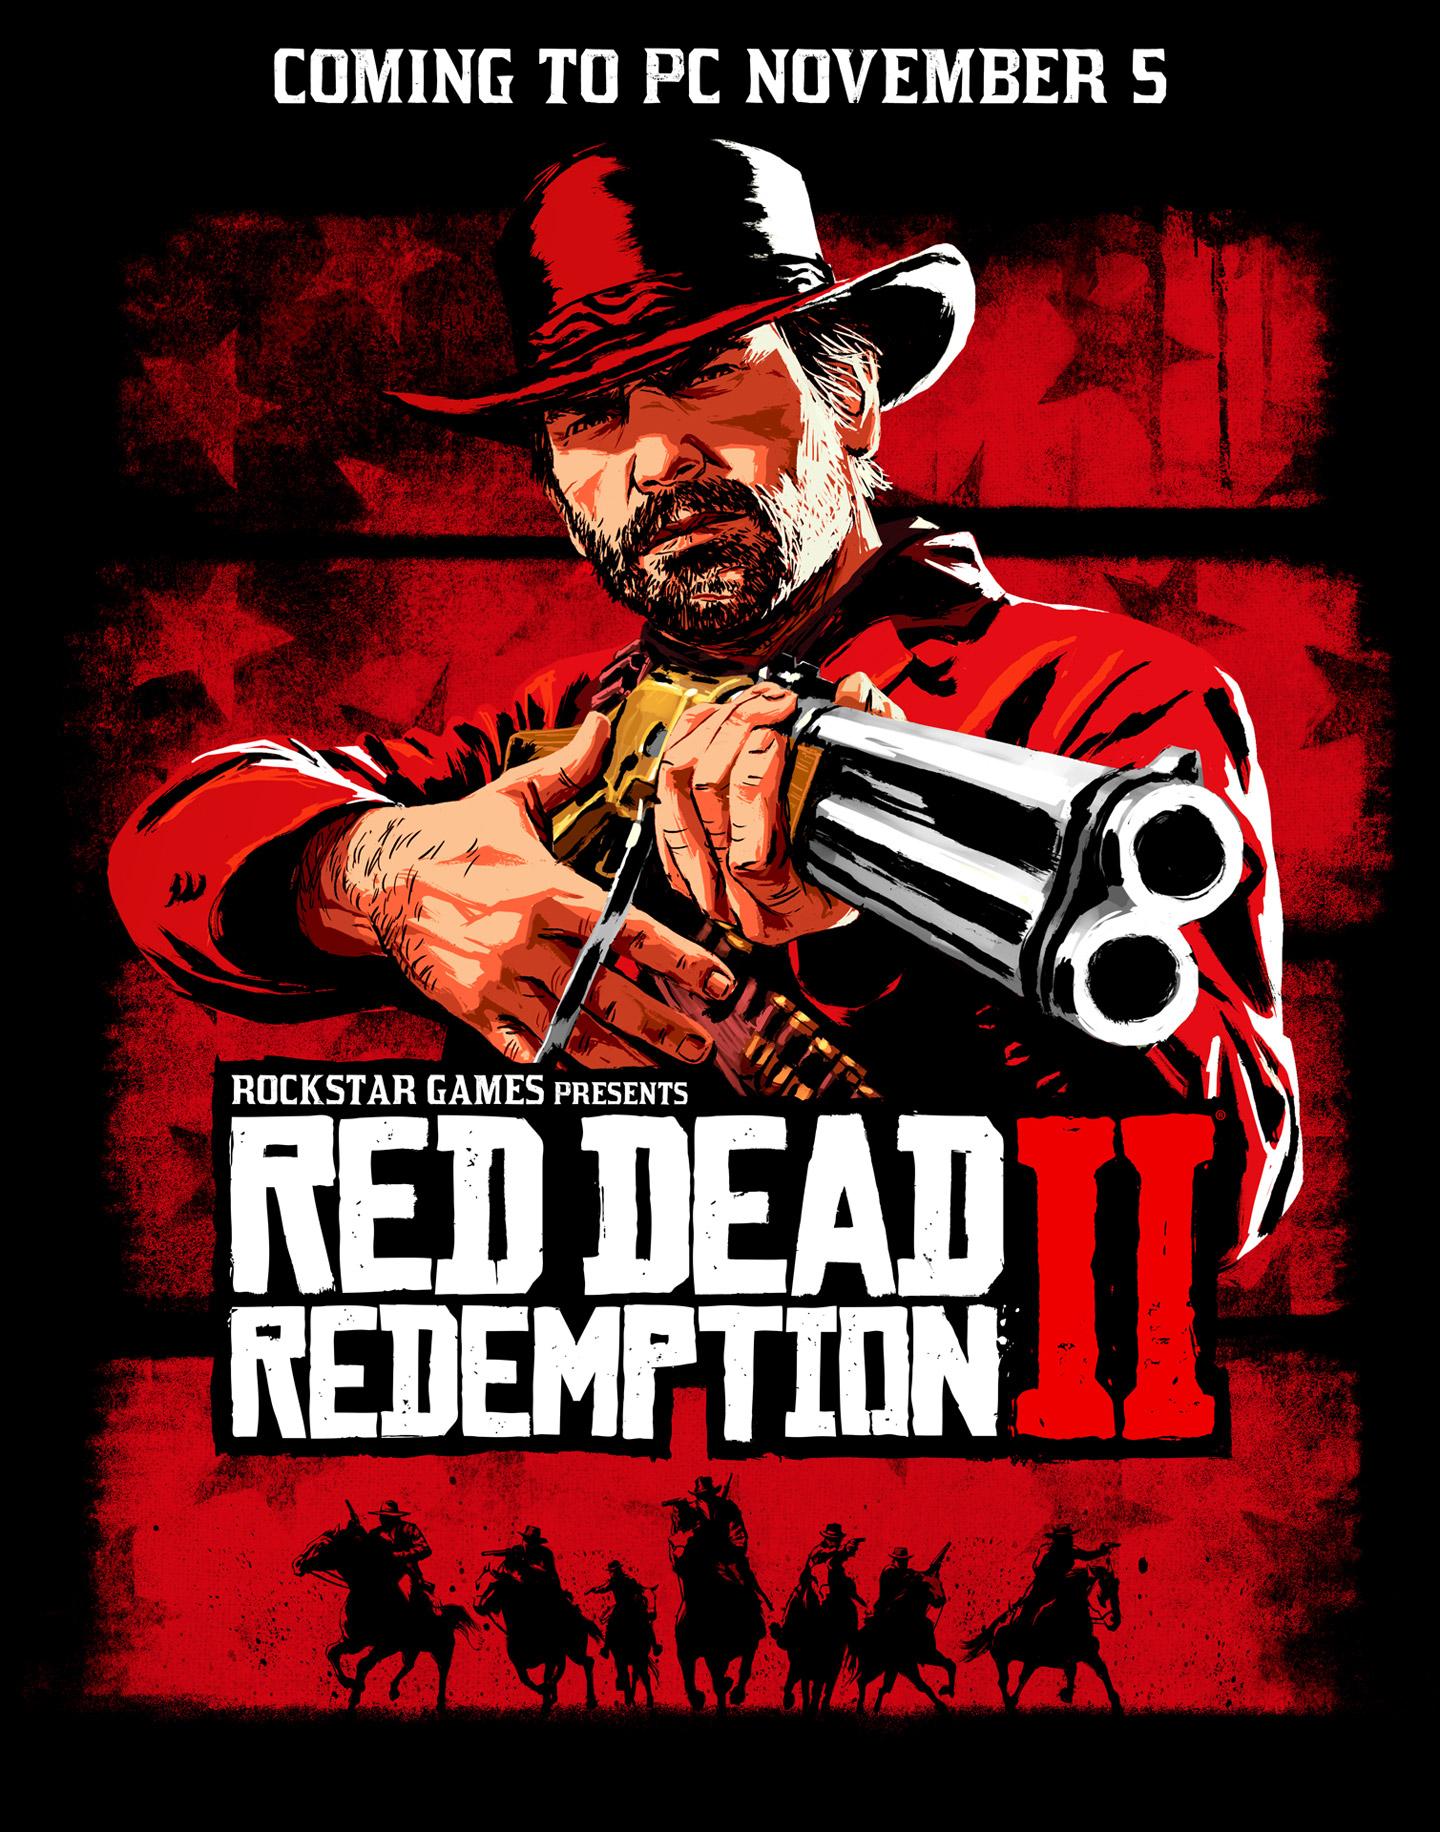 Red Dead Redemption 2 PC Vorbestellung + 2 Spiele nach Wahl (GTA III, GTA VC, MP3, Bully, L.A. Noire) über RU VPN